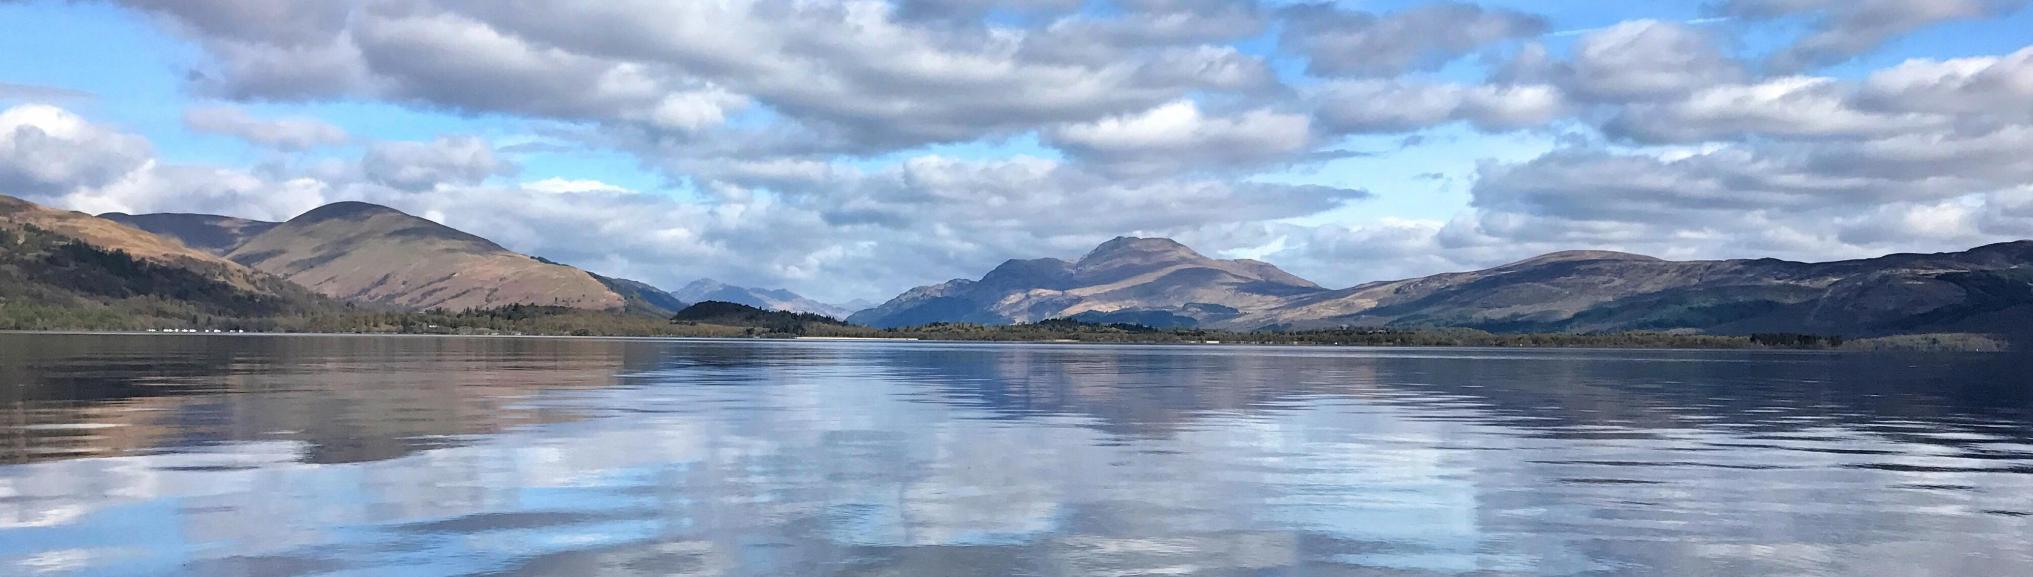 Loch Lomond Ben Nevis, Schotse Hooglanden